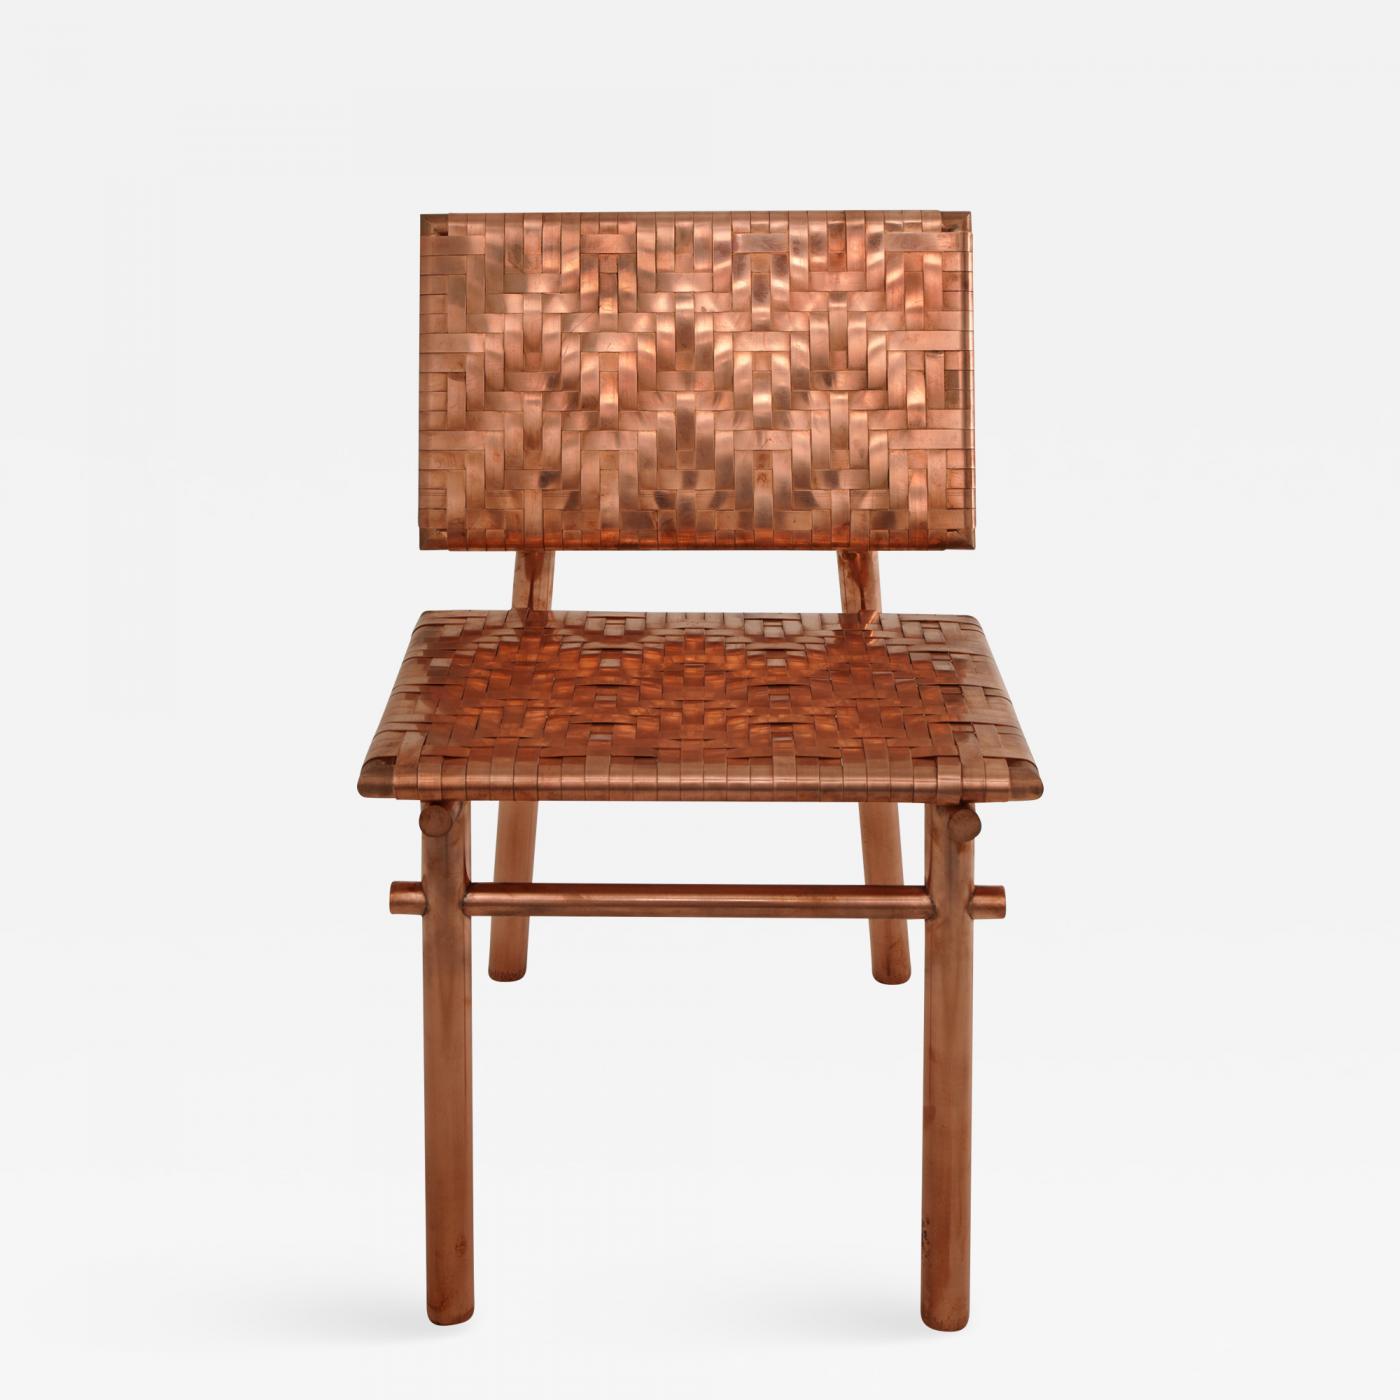 Remarkable Michael Gittings Rec Rec Chair Copper Chair Signed By Michael Gittings Creativecarmelina Interior Chair Design Creativecarmelinacom